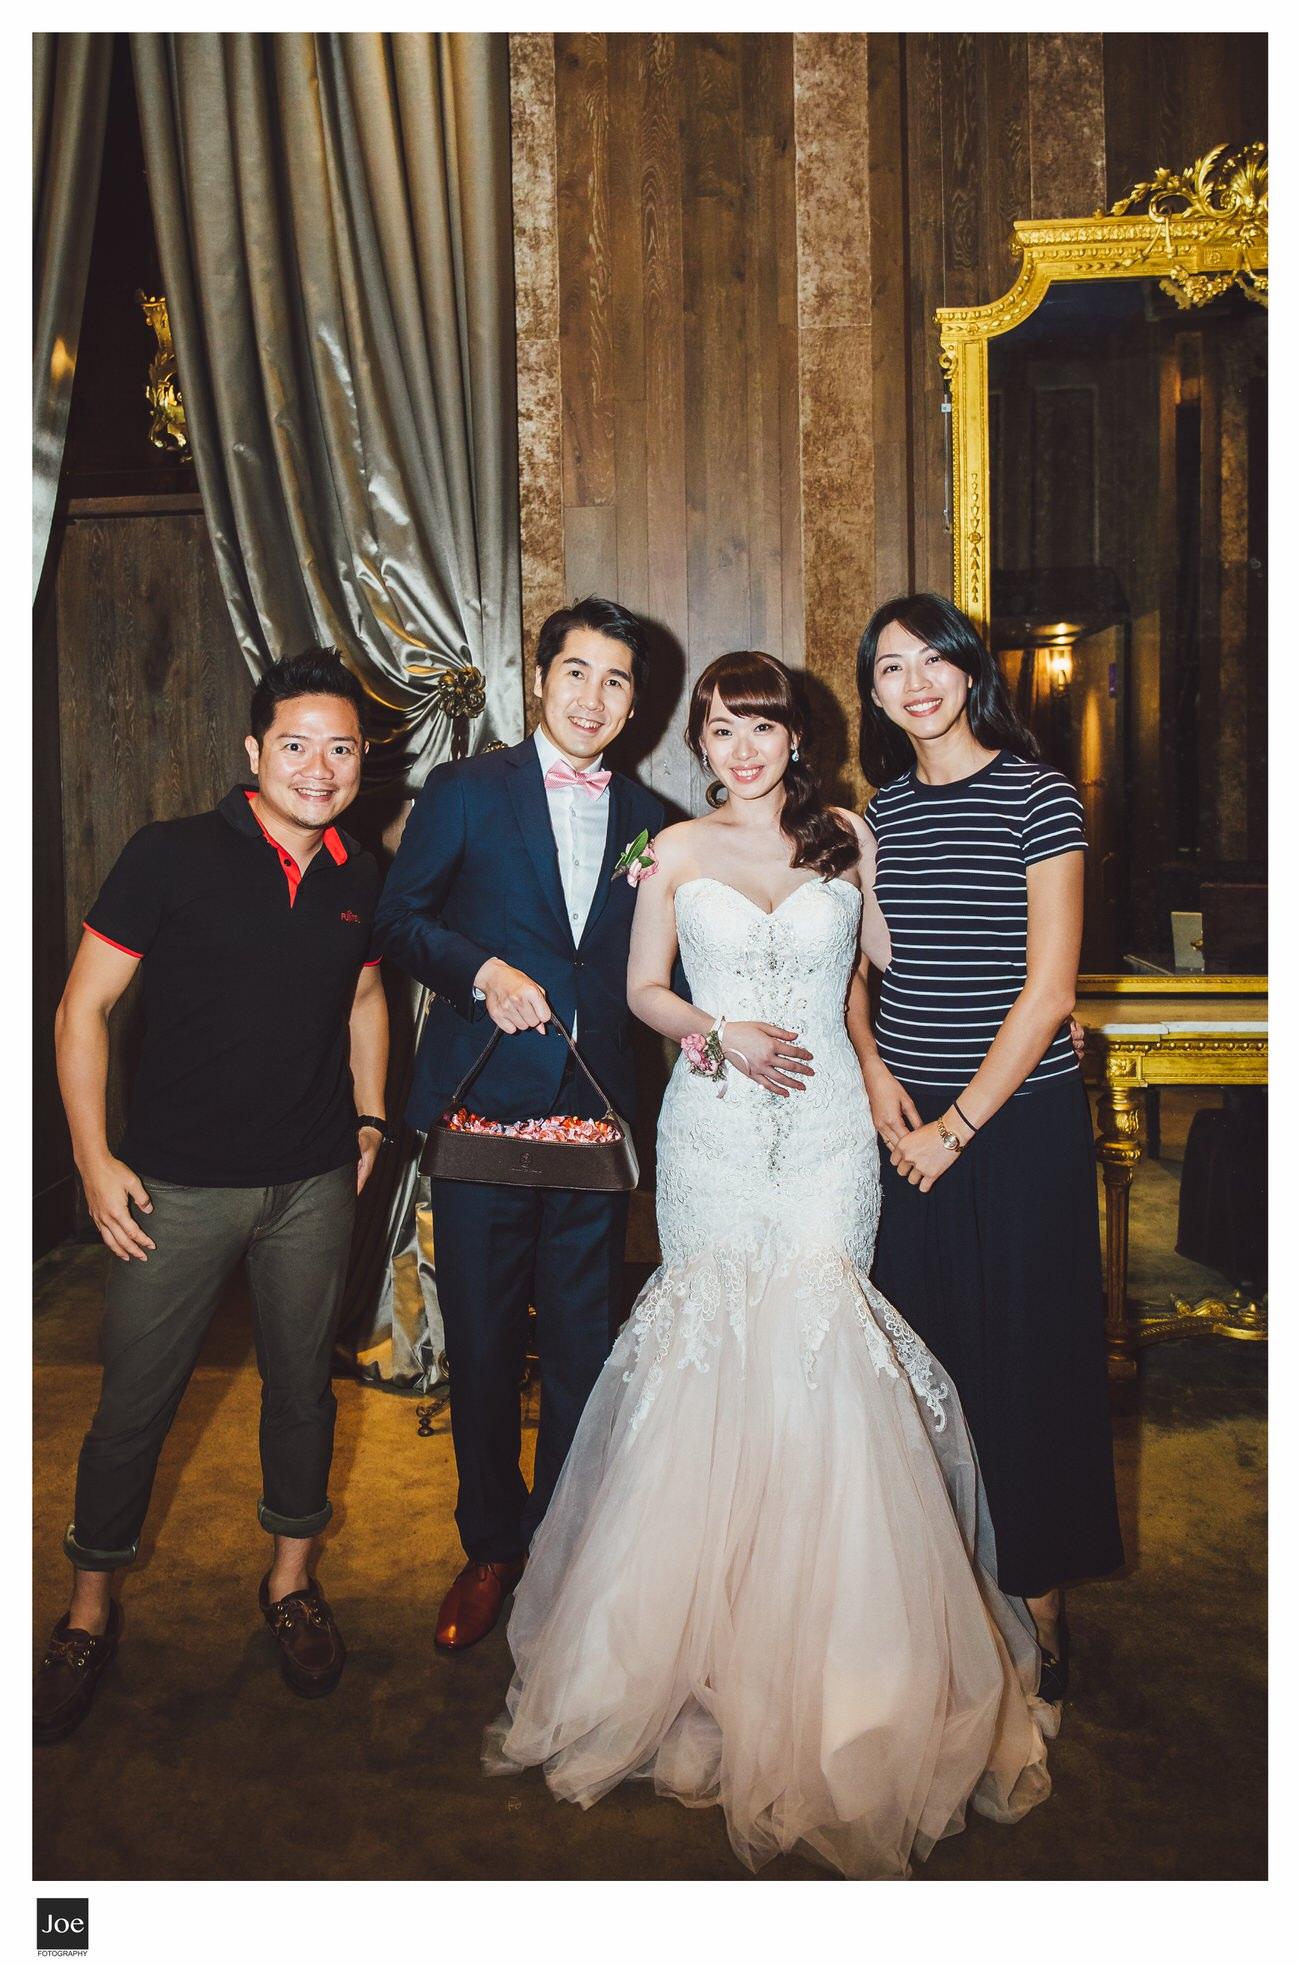 joe-fotography-wedding-photo-palais-de-chine-hotel-051.jpg